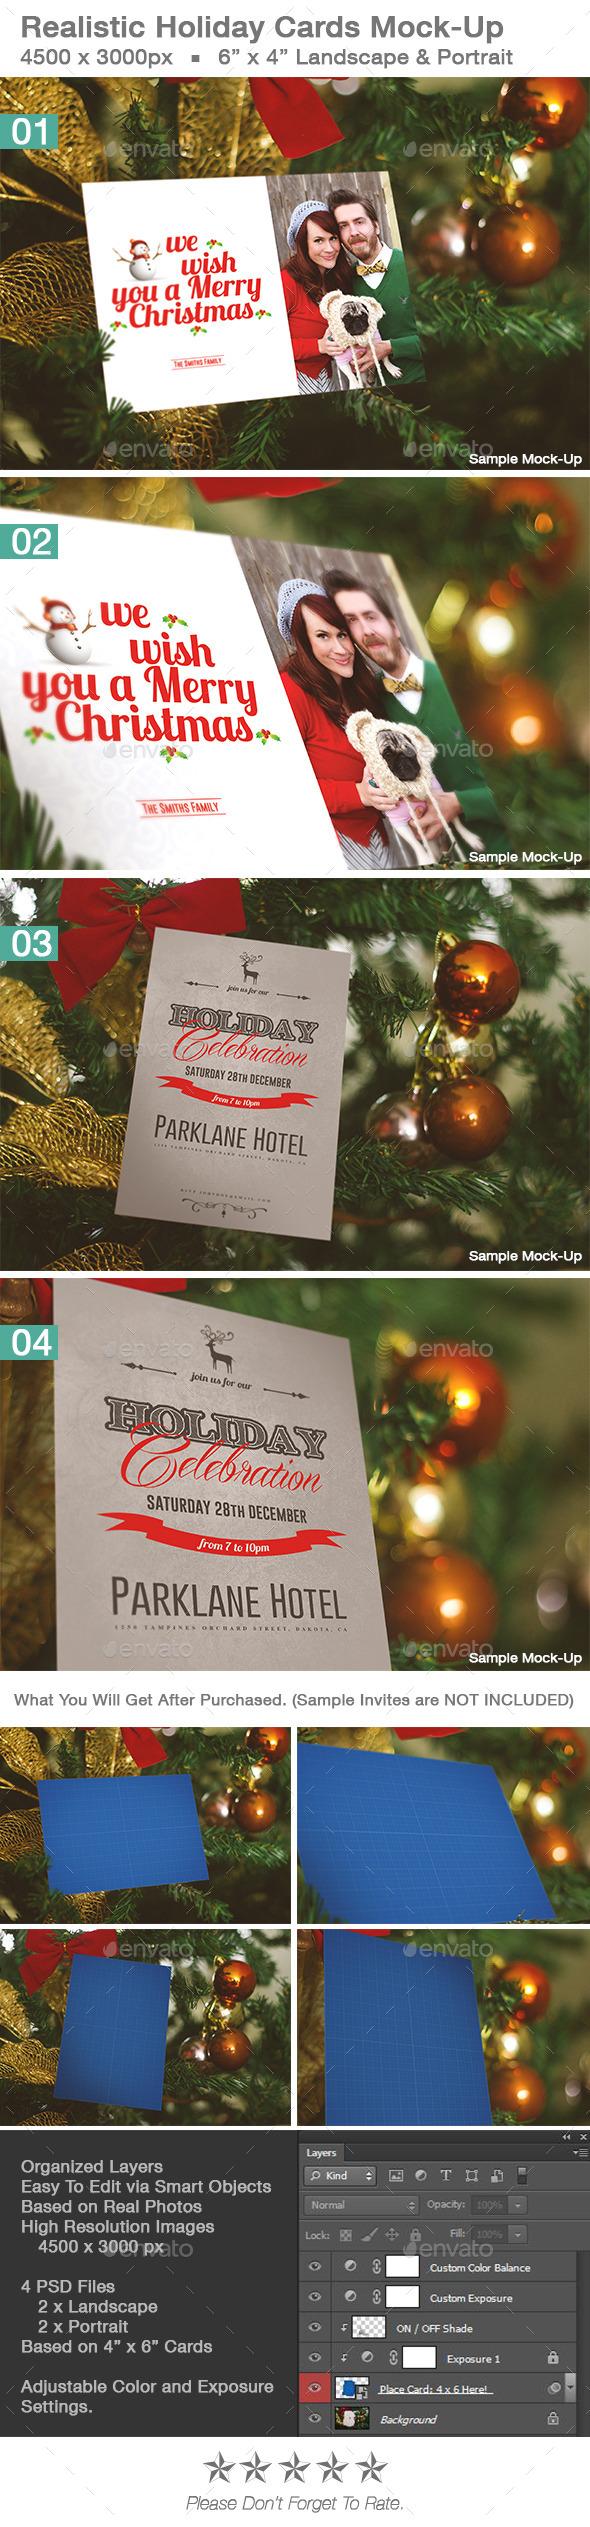 Realistic Holiday Card Mock-Up Vol 1